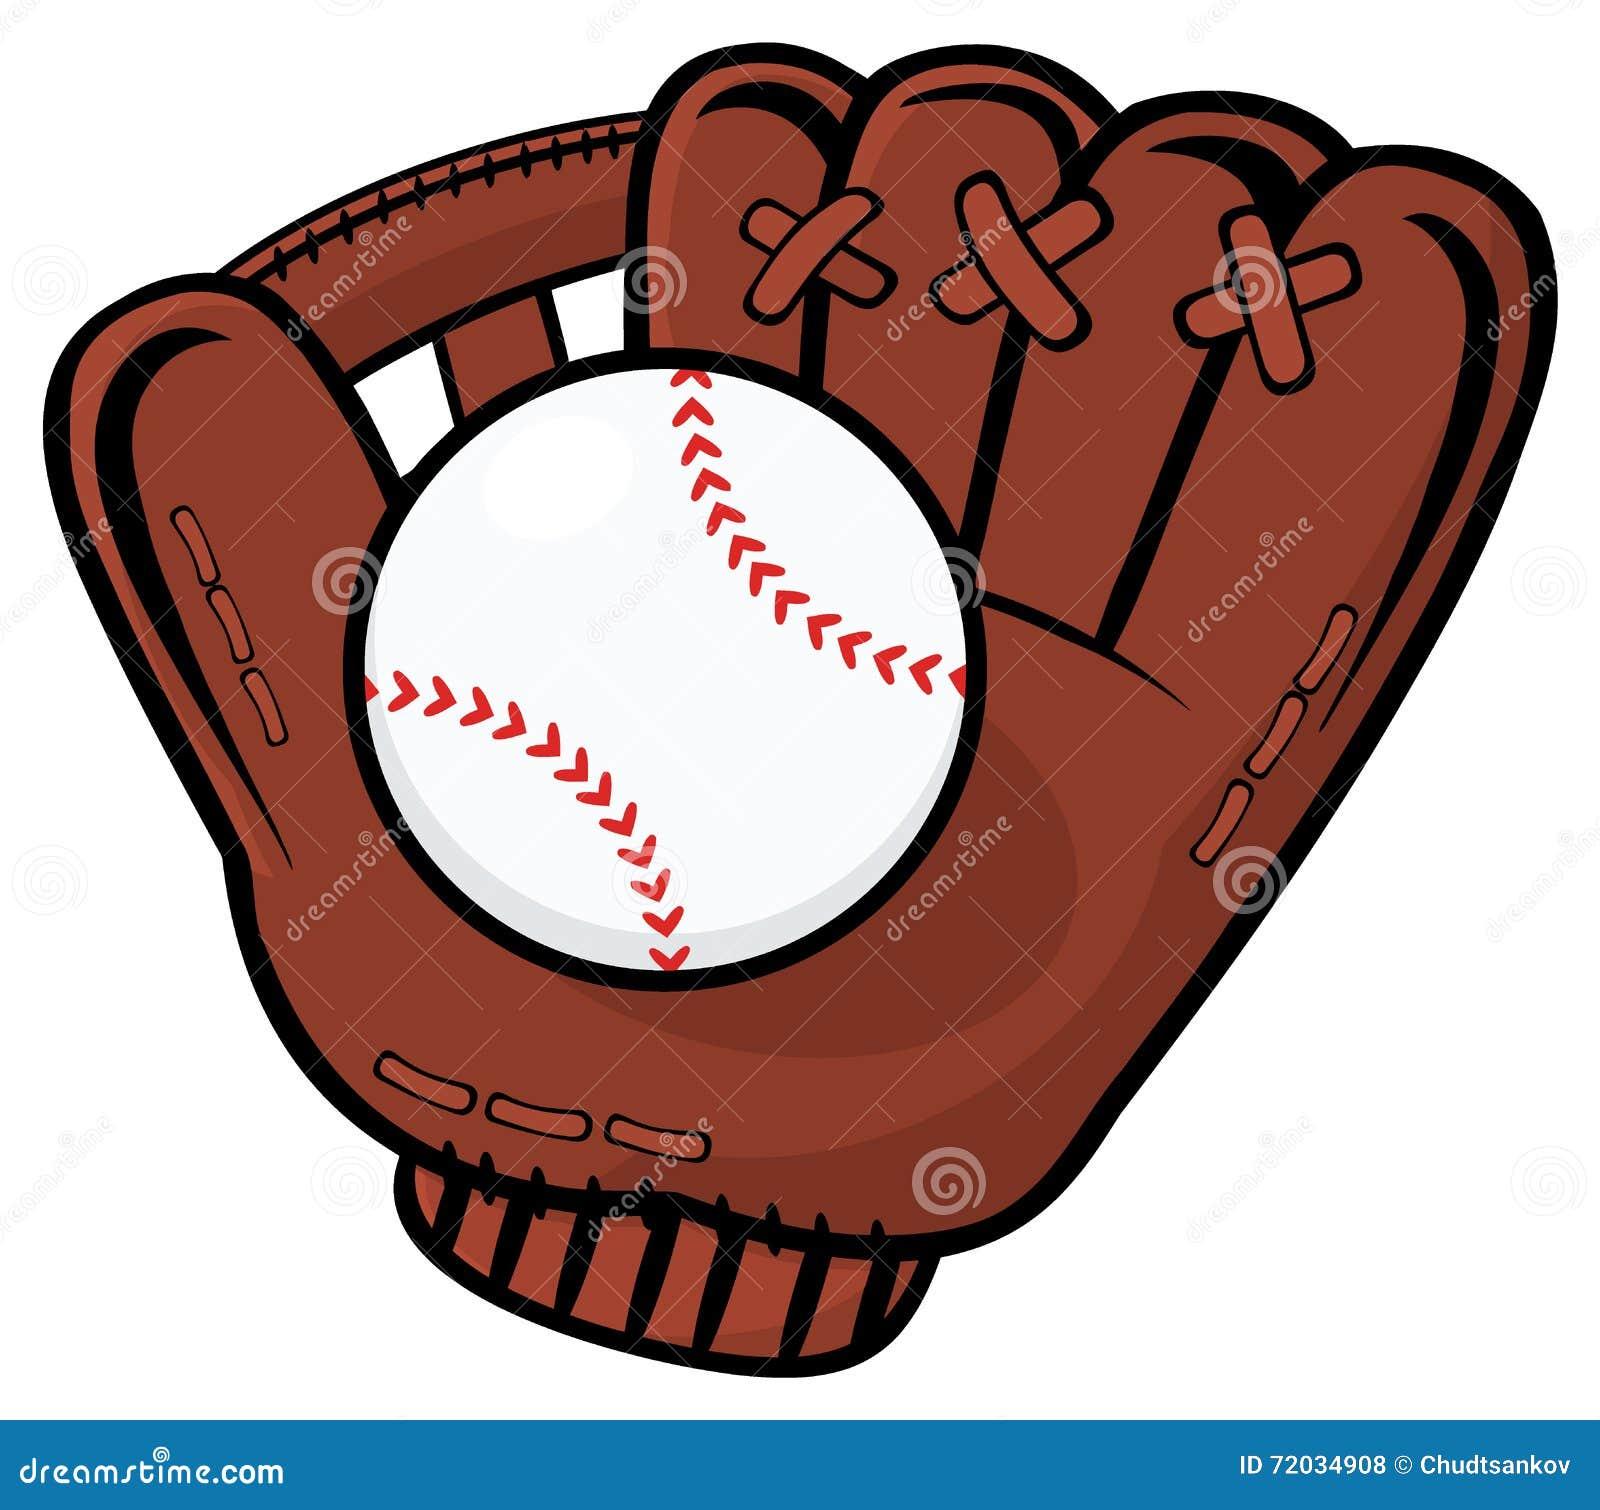 Guantes Beisbol. Good Guantes Para Beisbol Y Softbol. Trendy Guante ...